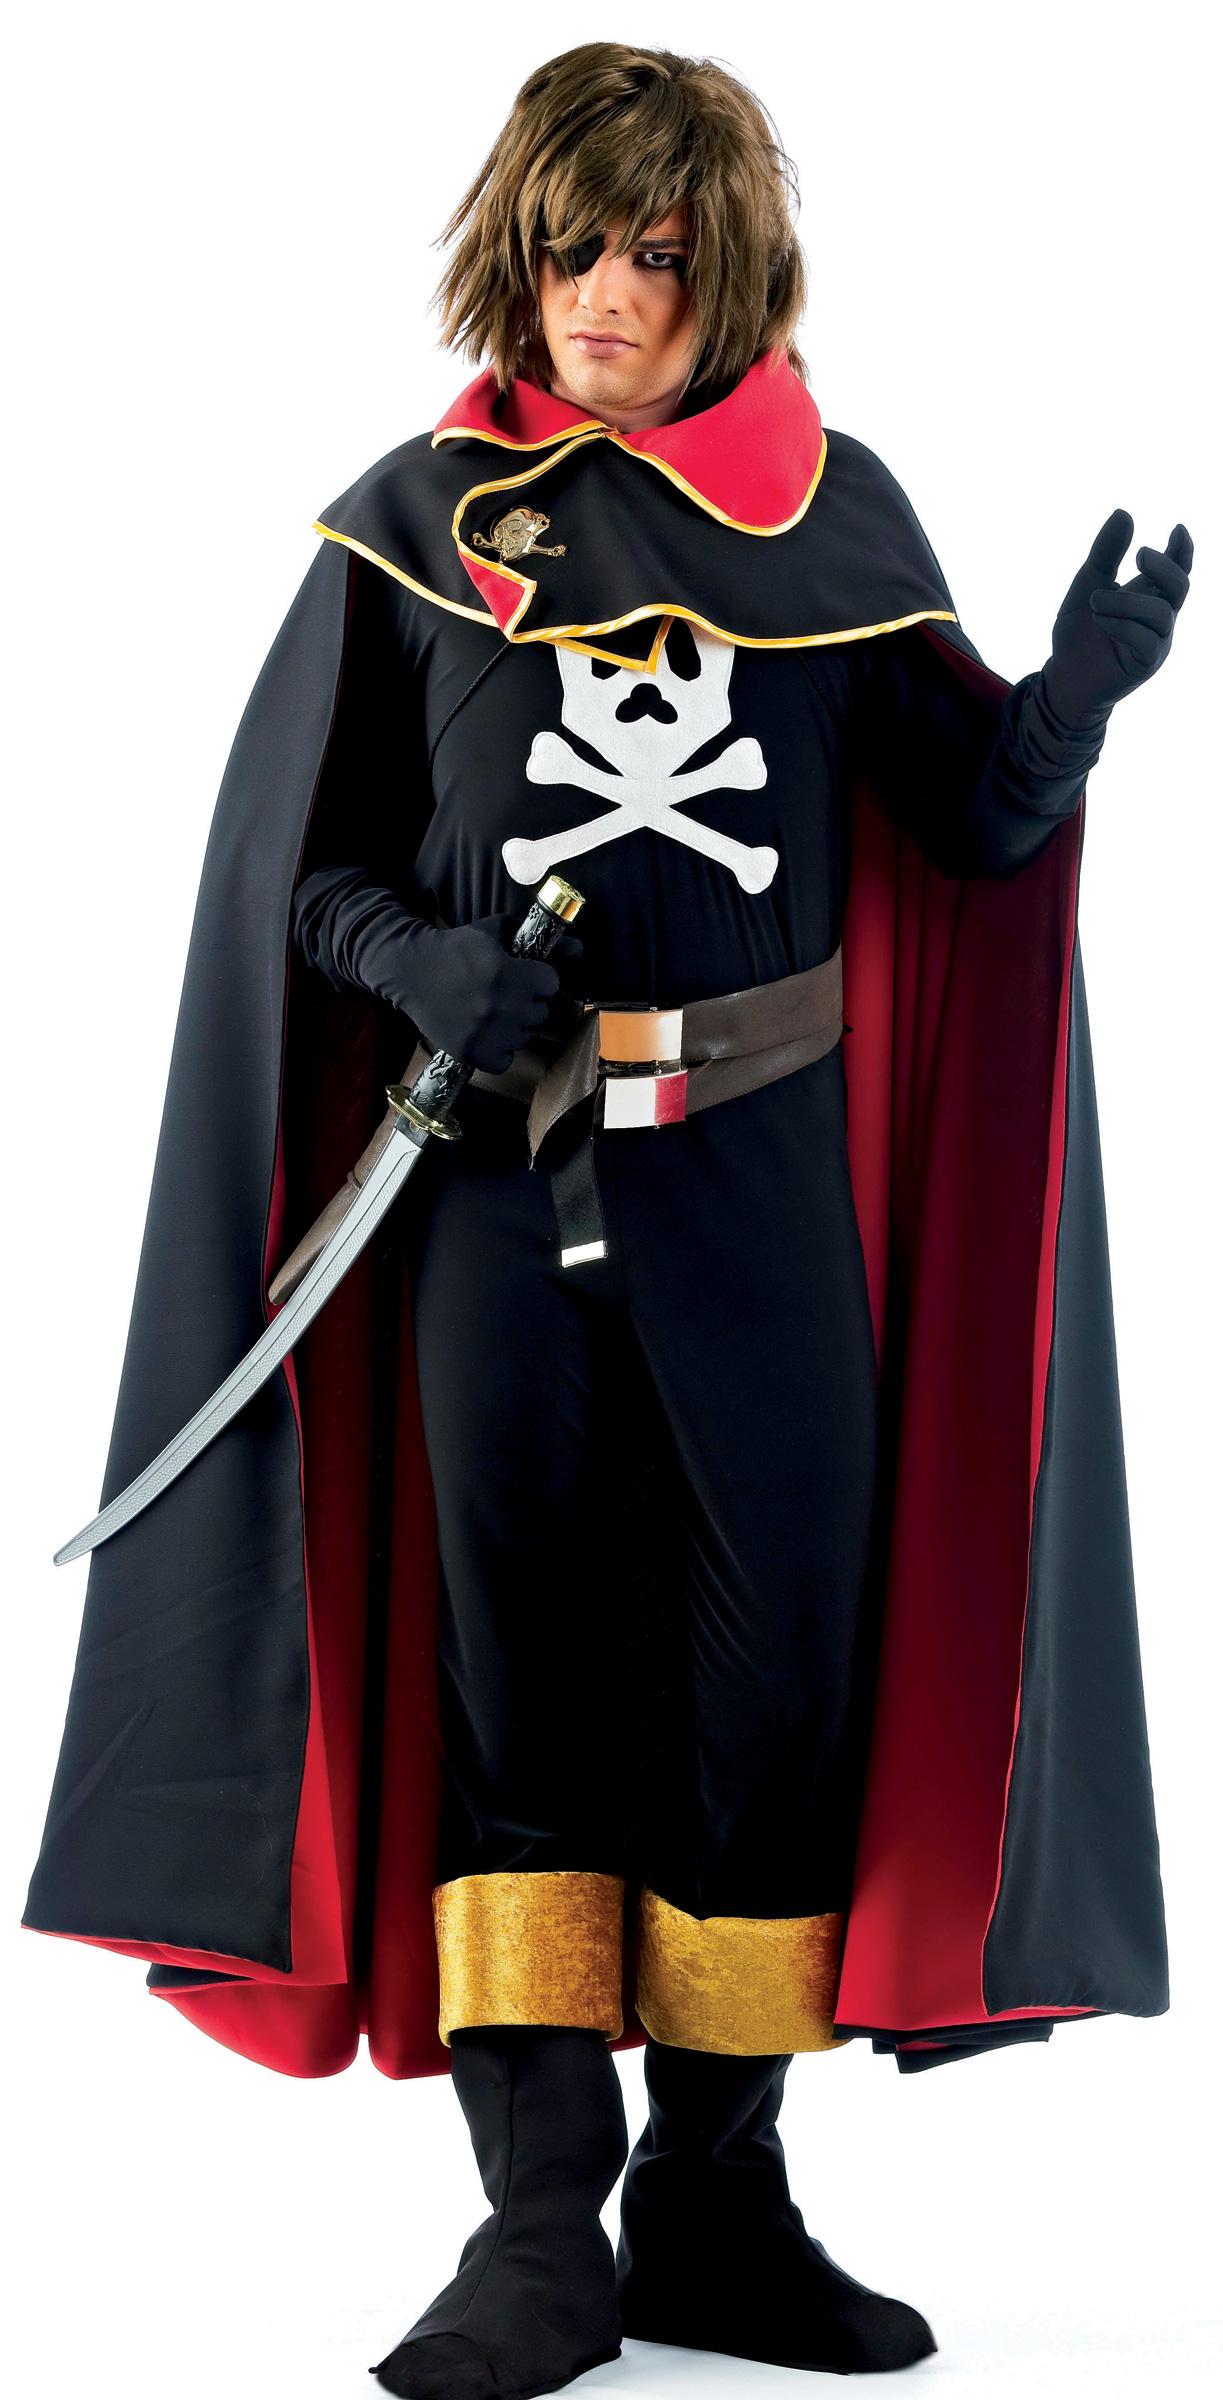 d guisement albator homme costume pirate de l 39 espace soir e costum e. Black Bedroom Furniture Sets. Home Design Ideas